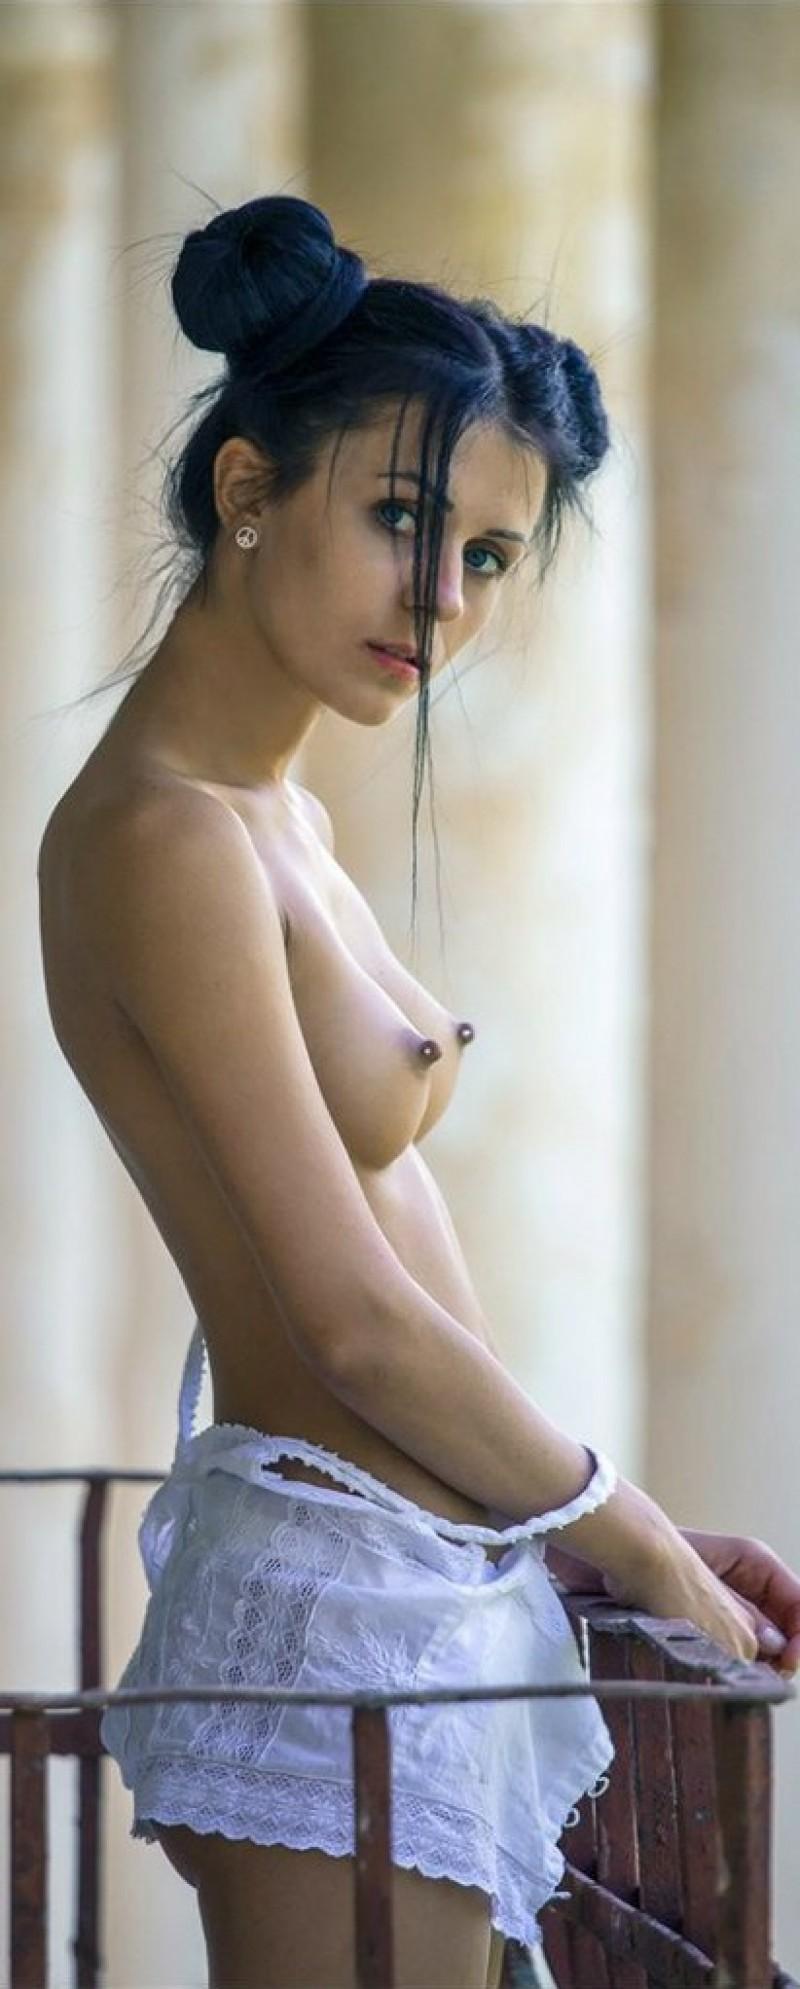 milf anal workout in the gym #2girls  #bitingnipple  #boobs  #breakfast  #ff  #fruit  #lesbians  #nibbling  #nibblingnips  #nipplebite  #nipplebite  #nipplebiting  #nipplemunch  #nipplepull  #pullingnipple  #ripe  #sideboob  #sideboobandnipple  #sideview  #twogirls